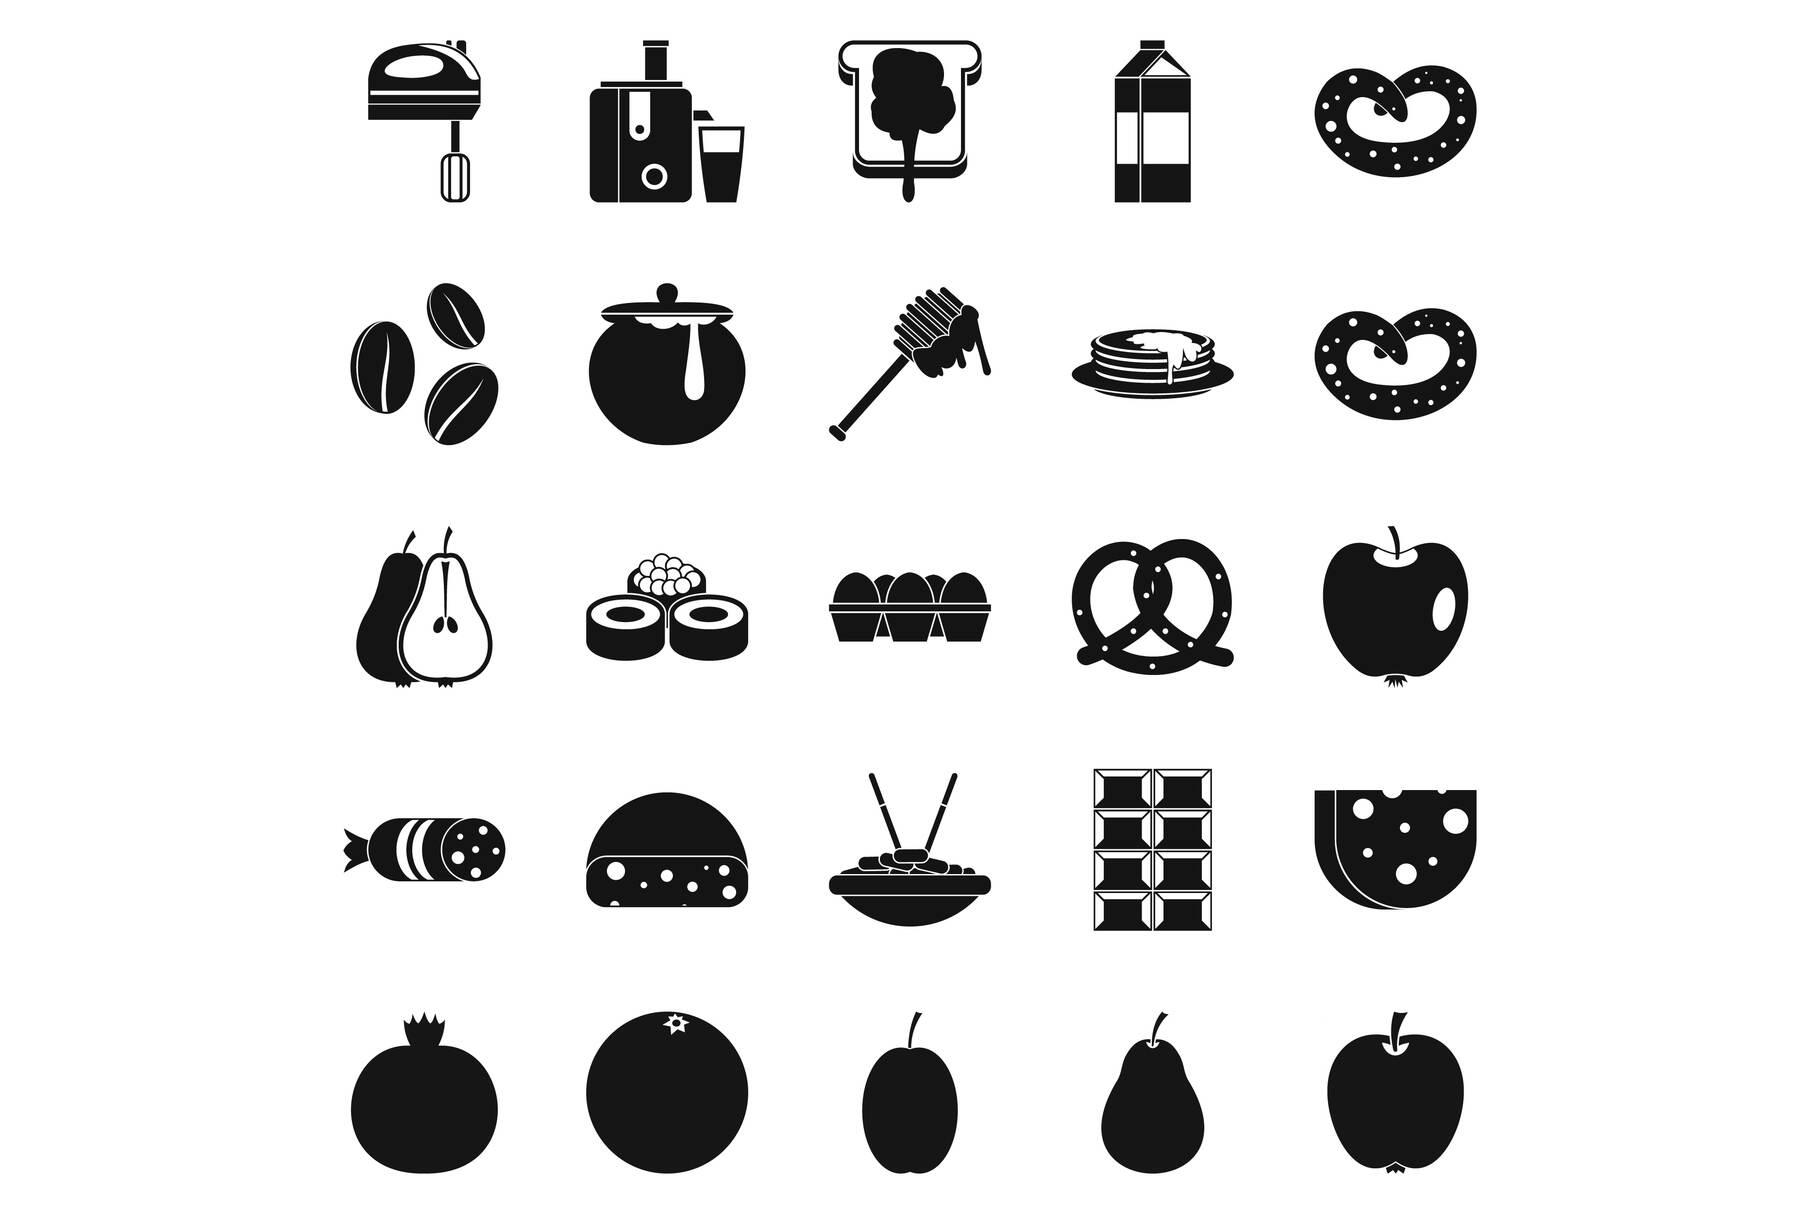 Nourishment icons set, simple style example image 1